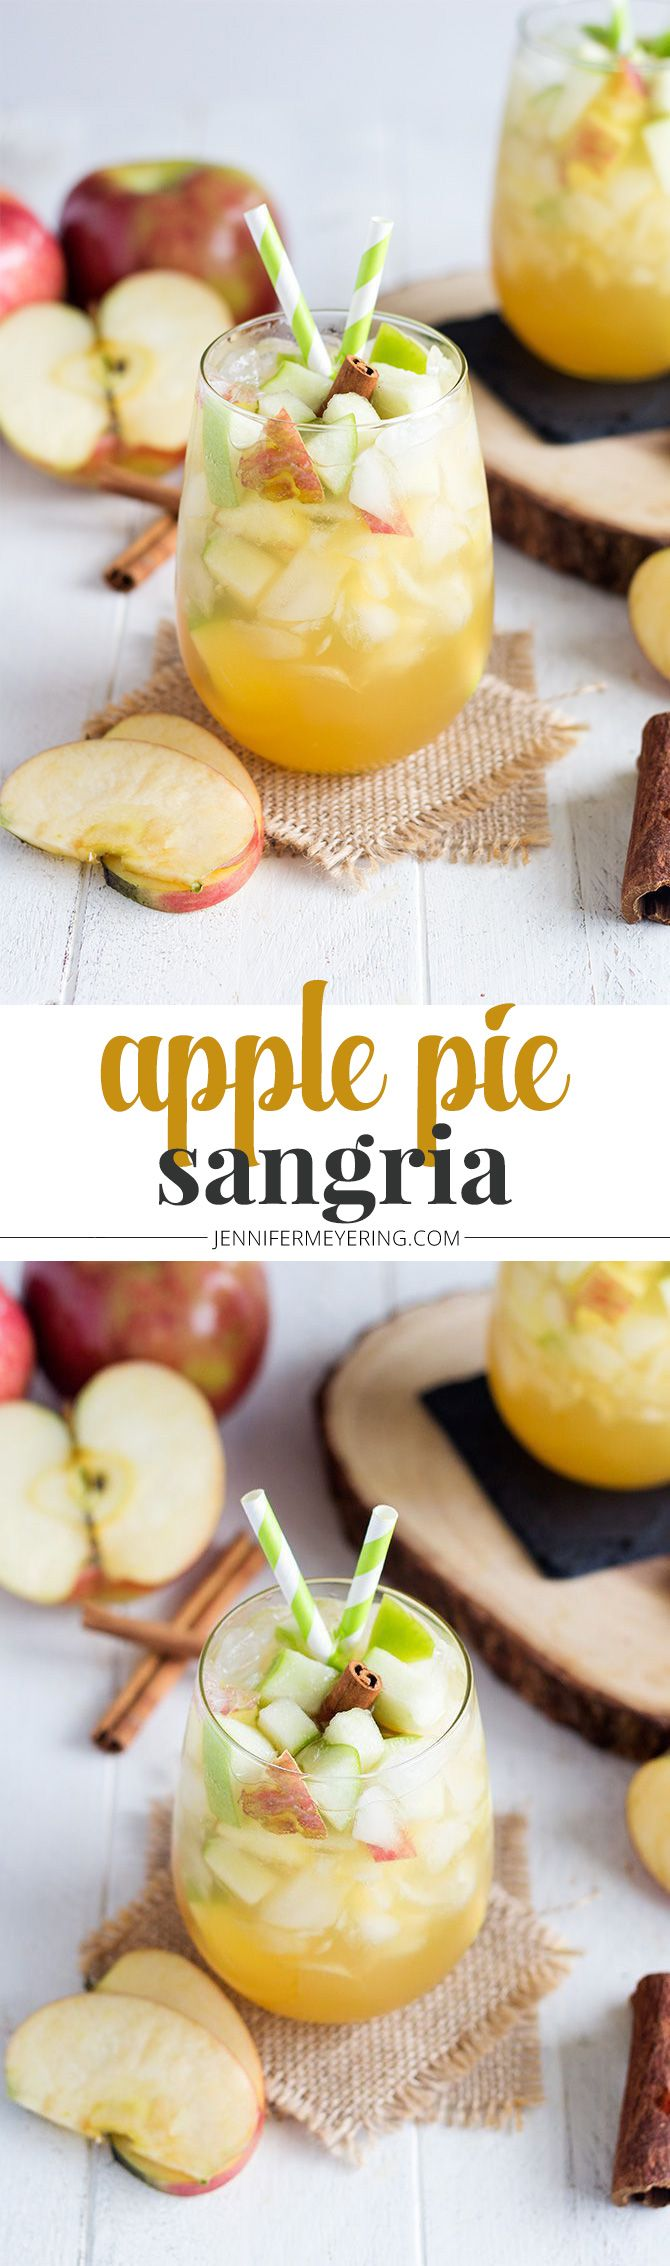 Apple Pie Sangria - JenniferMeyering.com